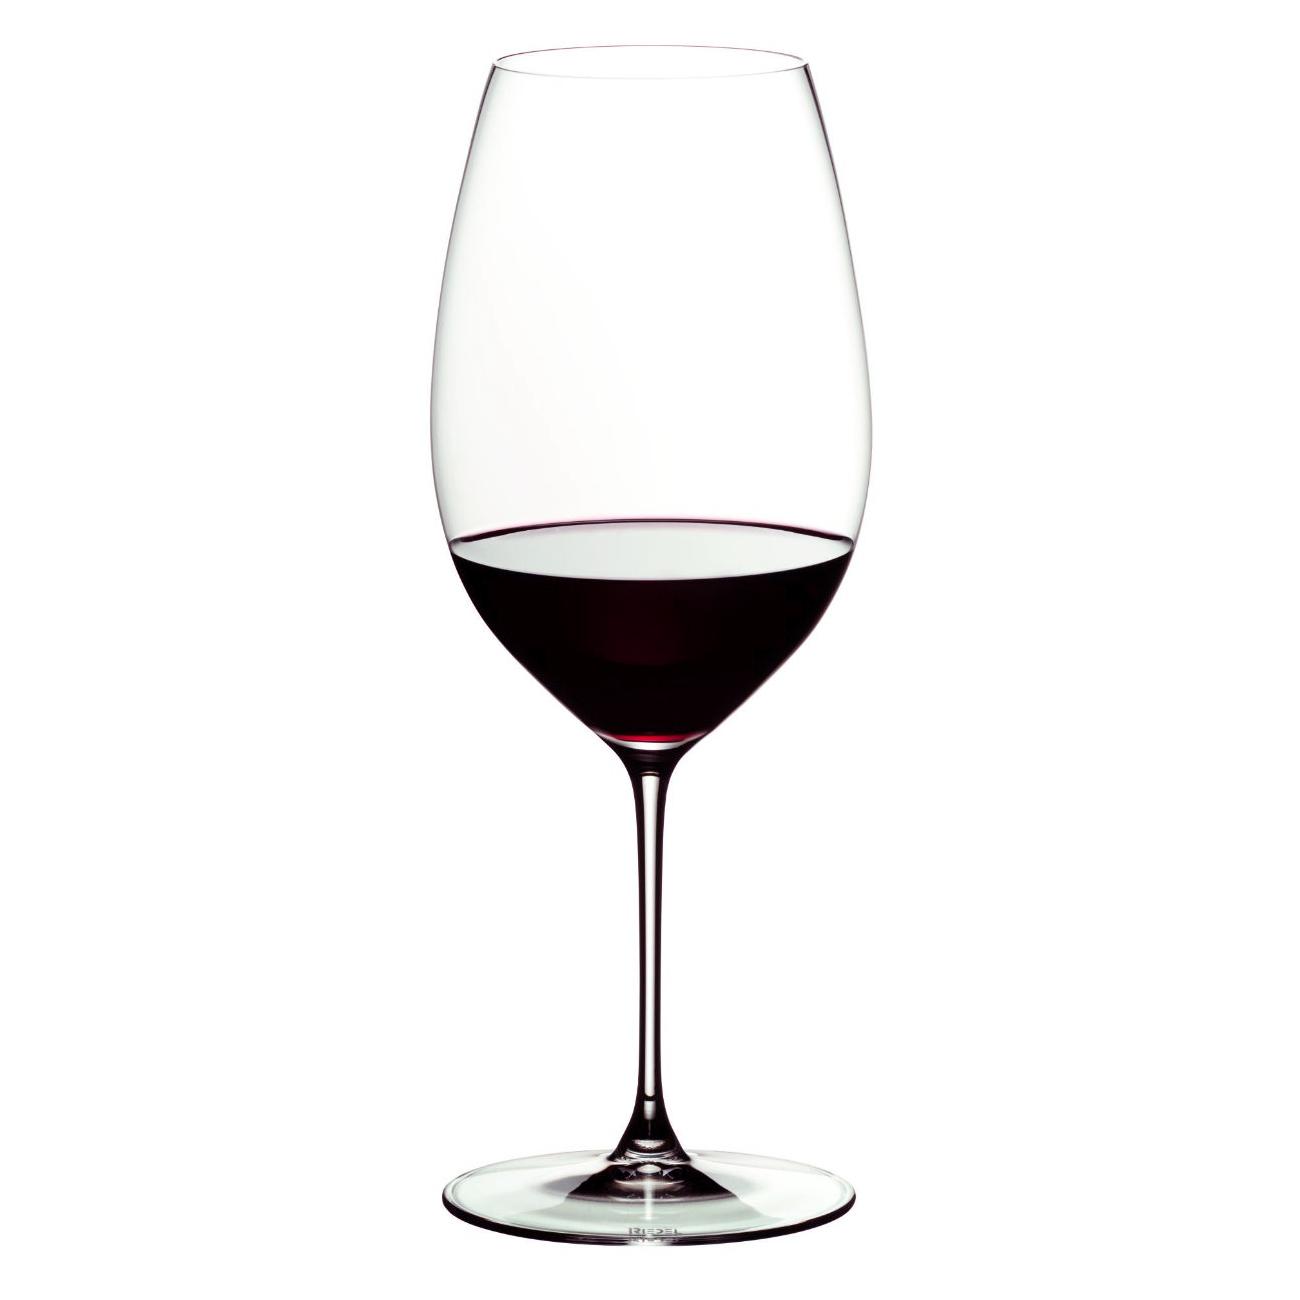 Riedel Veritas Leaded Crystal New World Shiraz Wine Glass, Set of 2